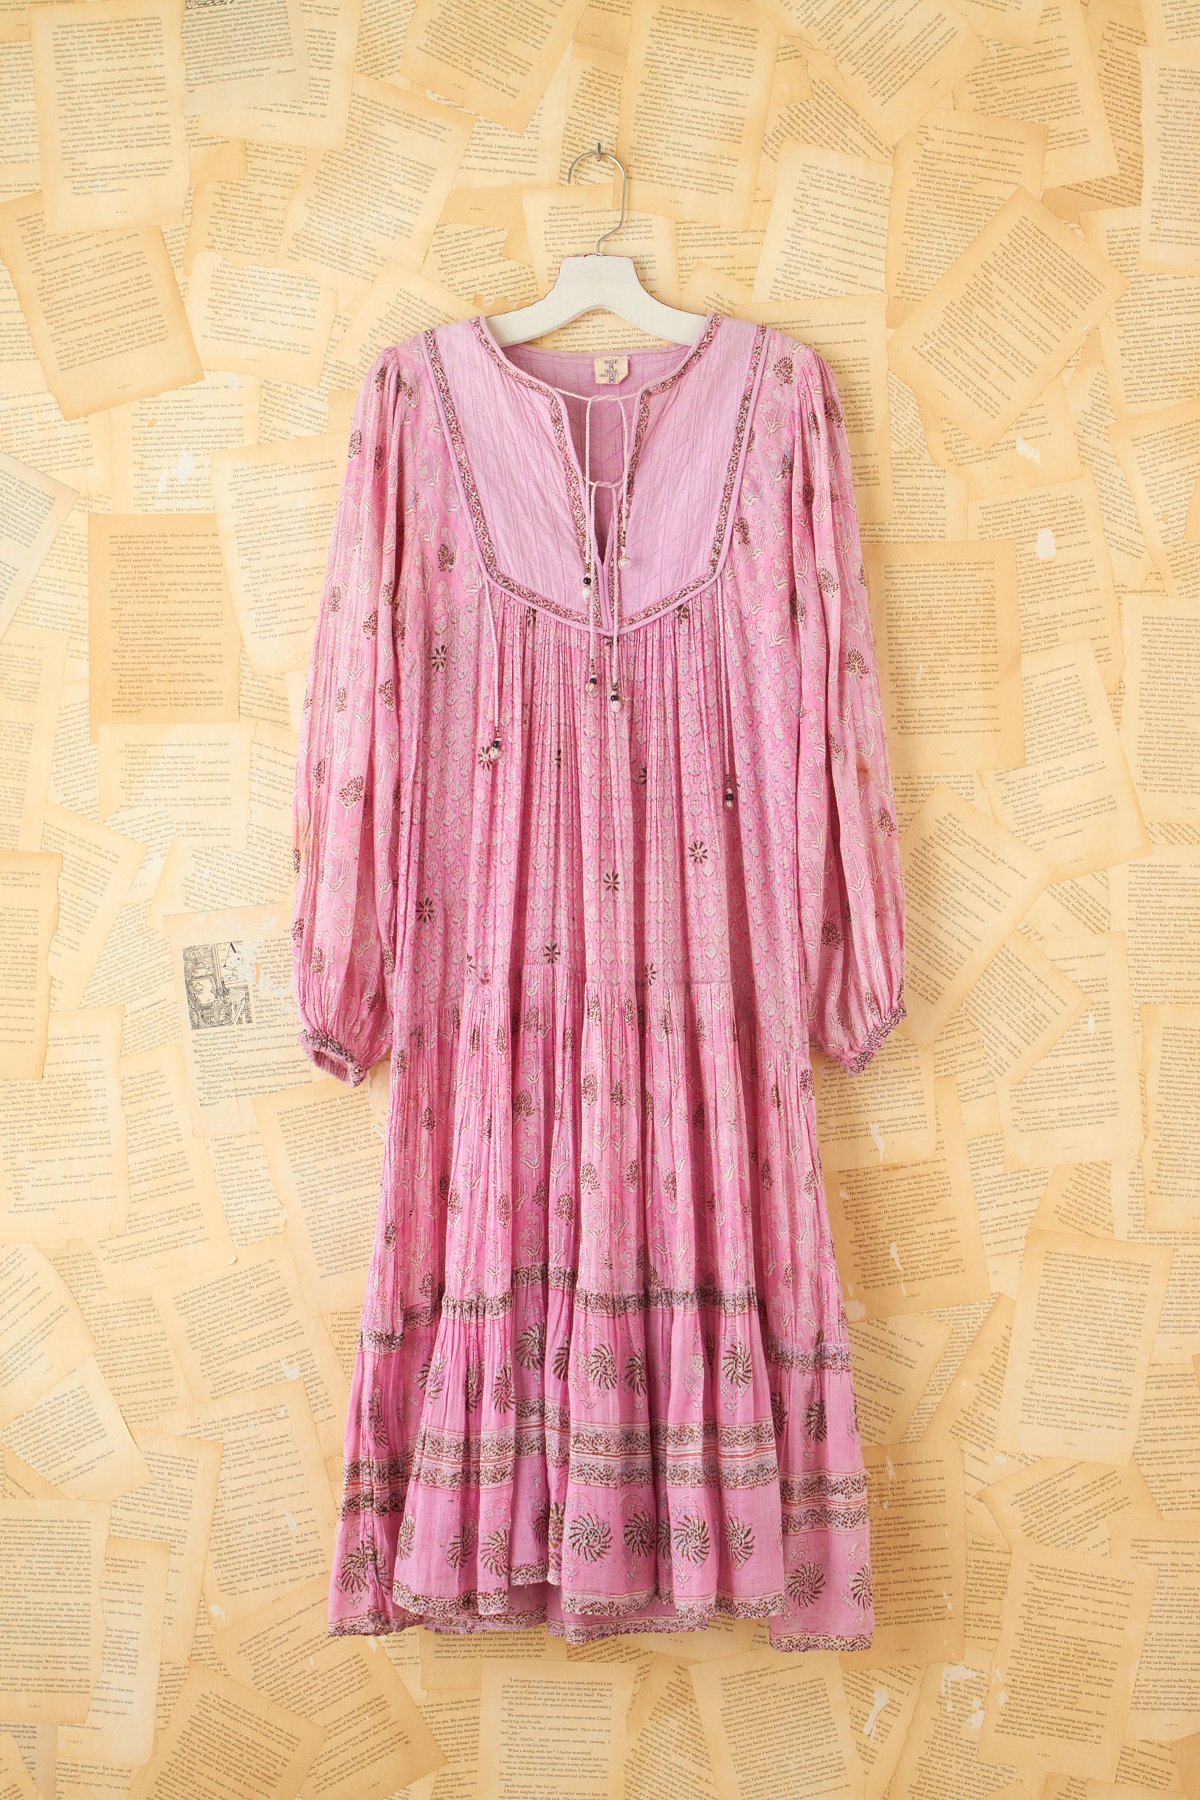 Vintage Quilted Neckline Dress